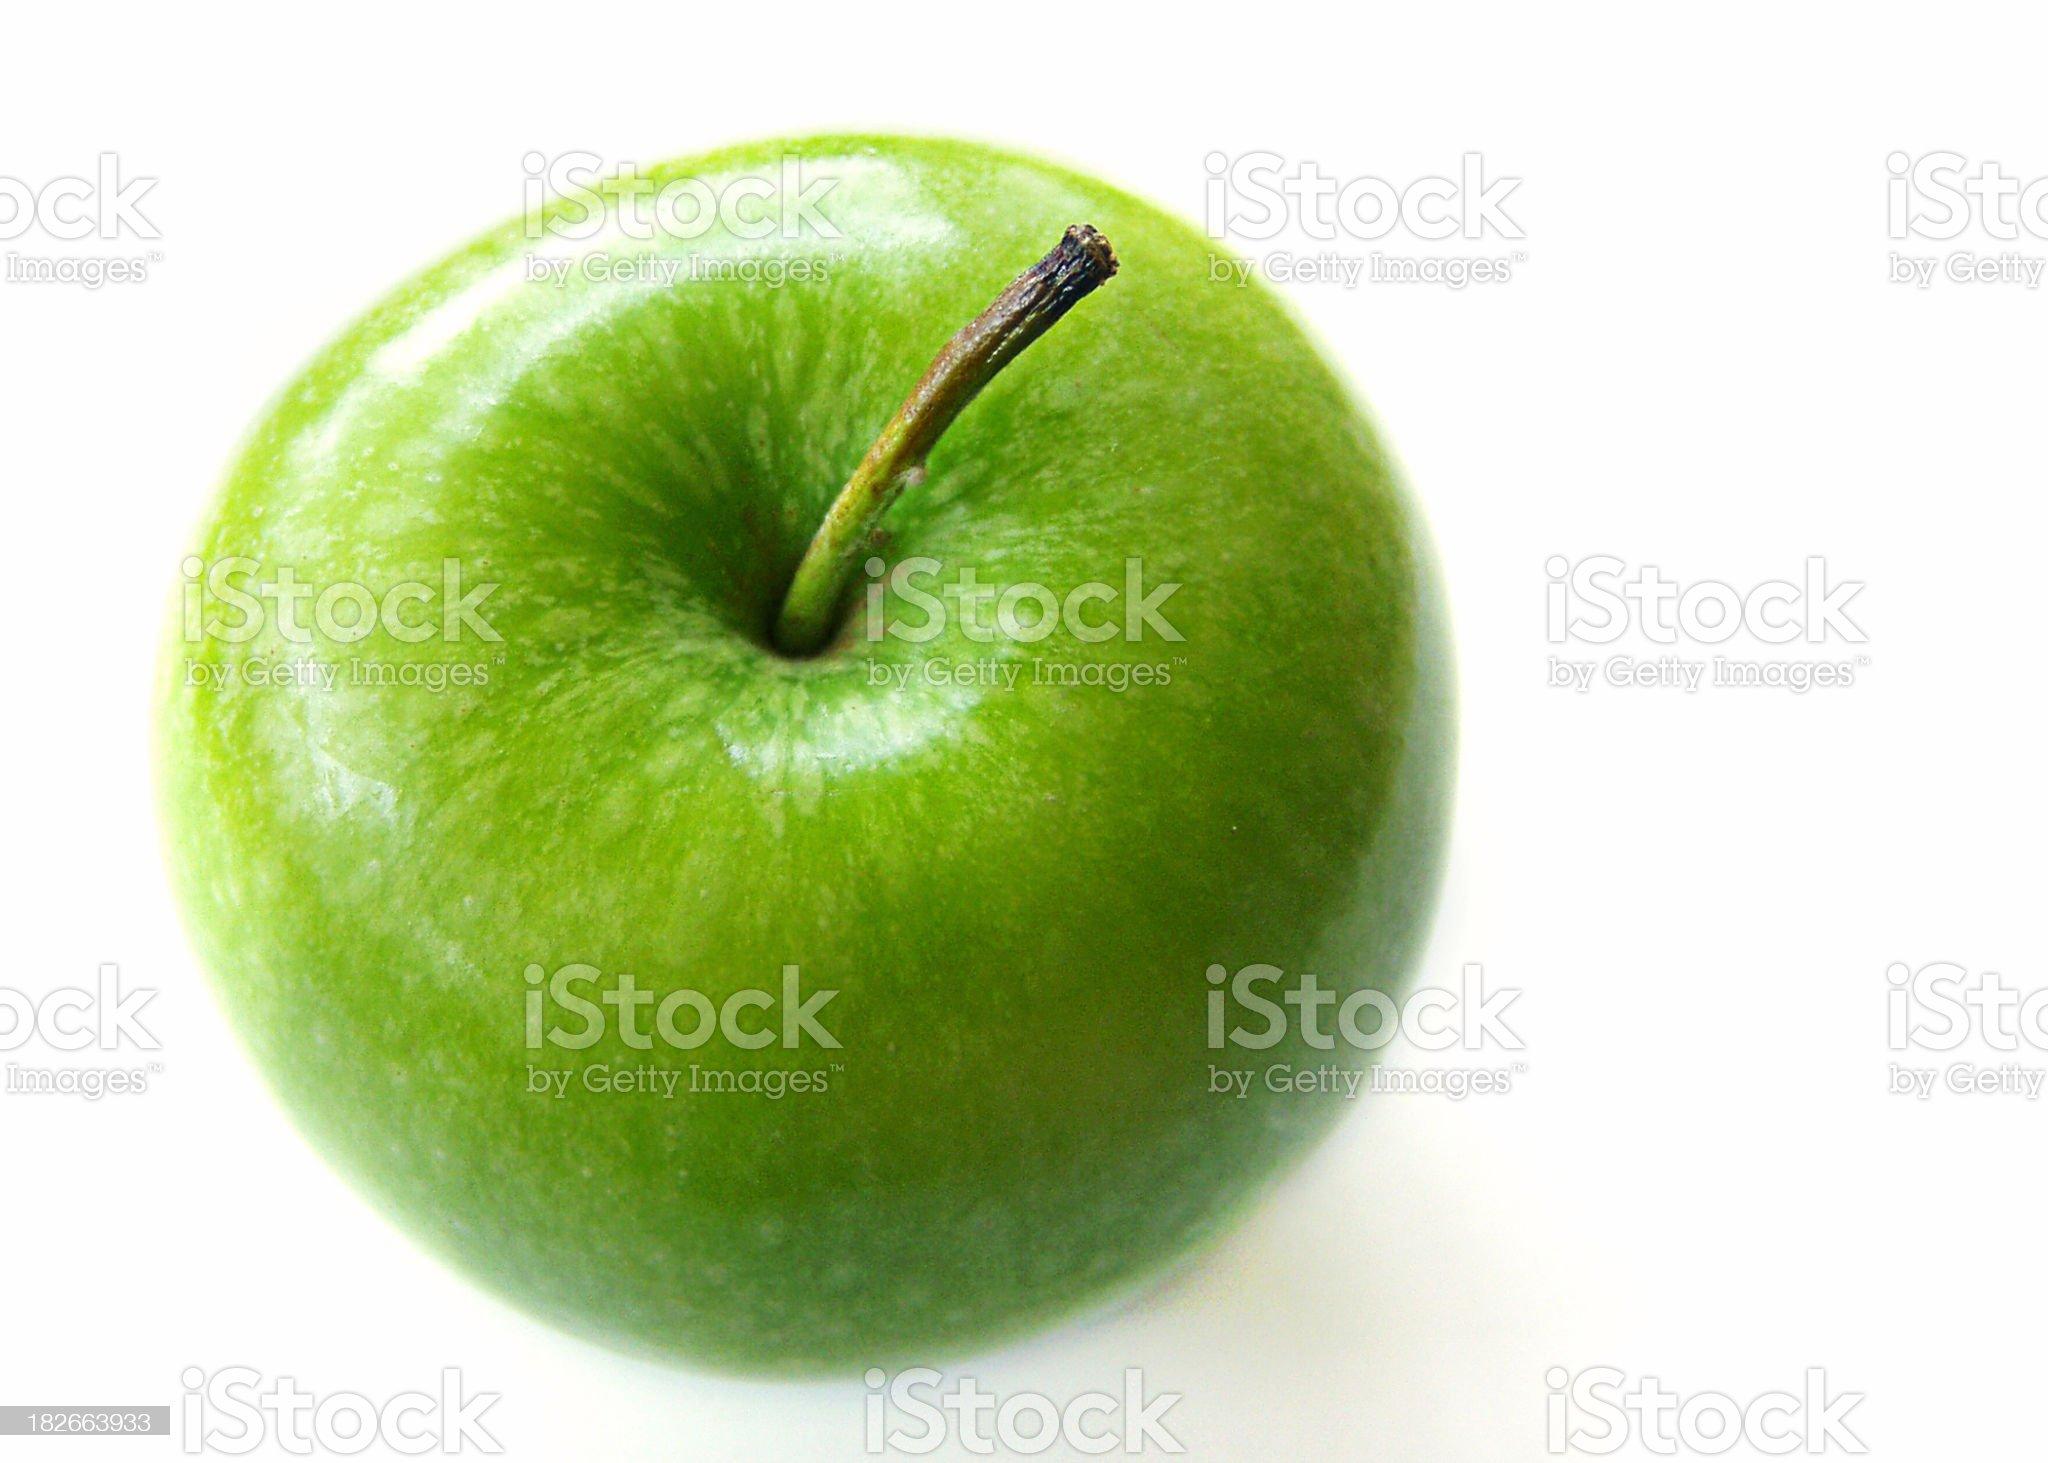 Close up photo of green Granny Smith apple royalty-free stock photo